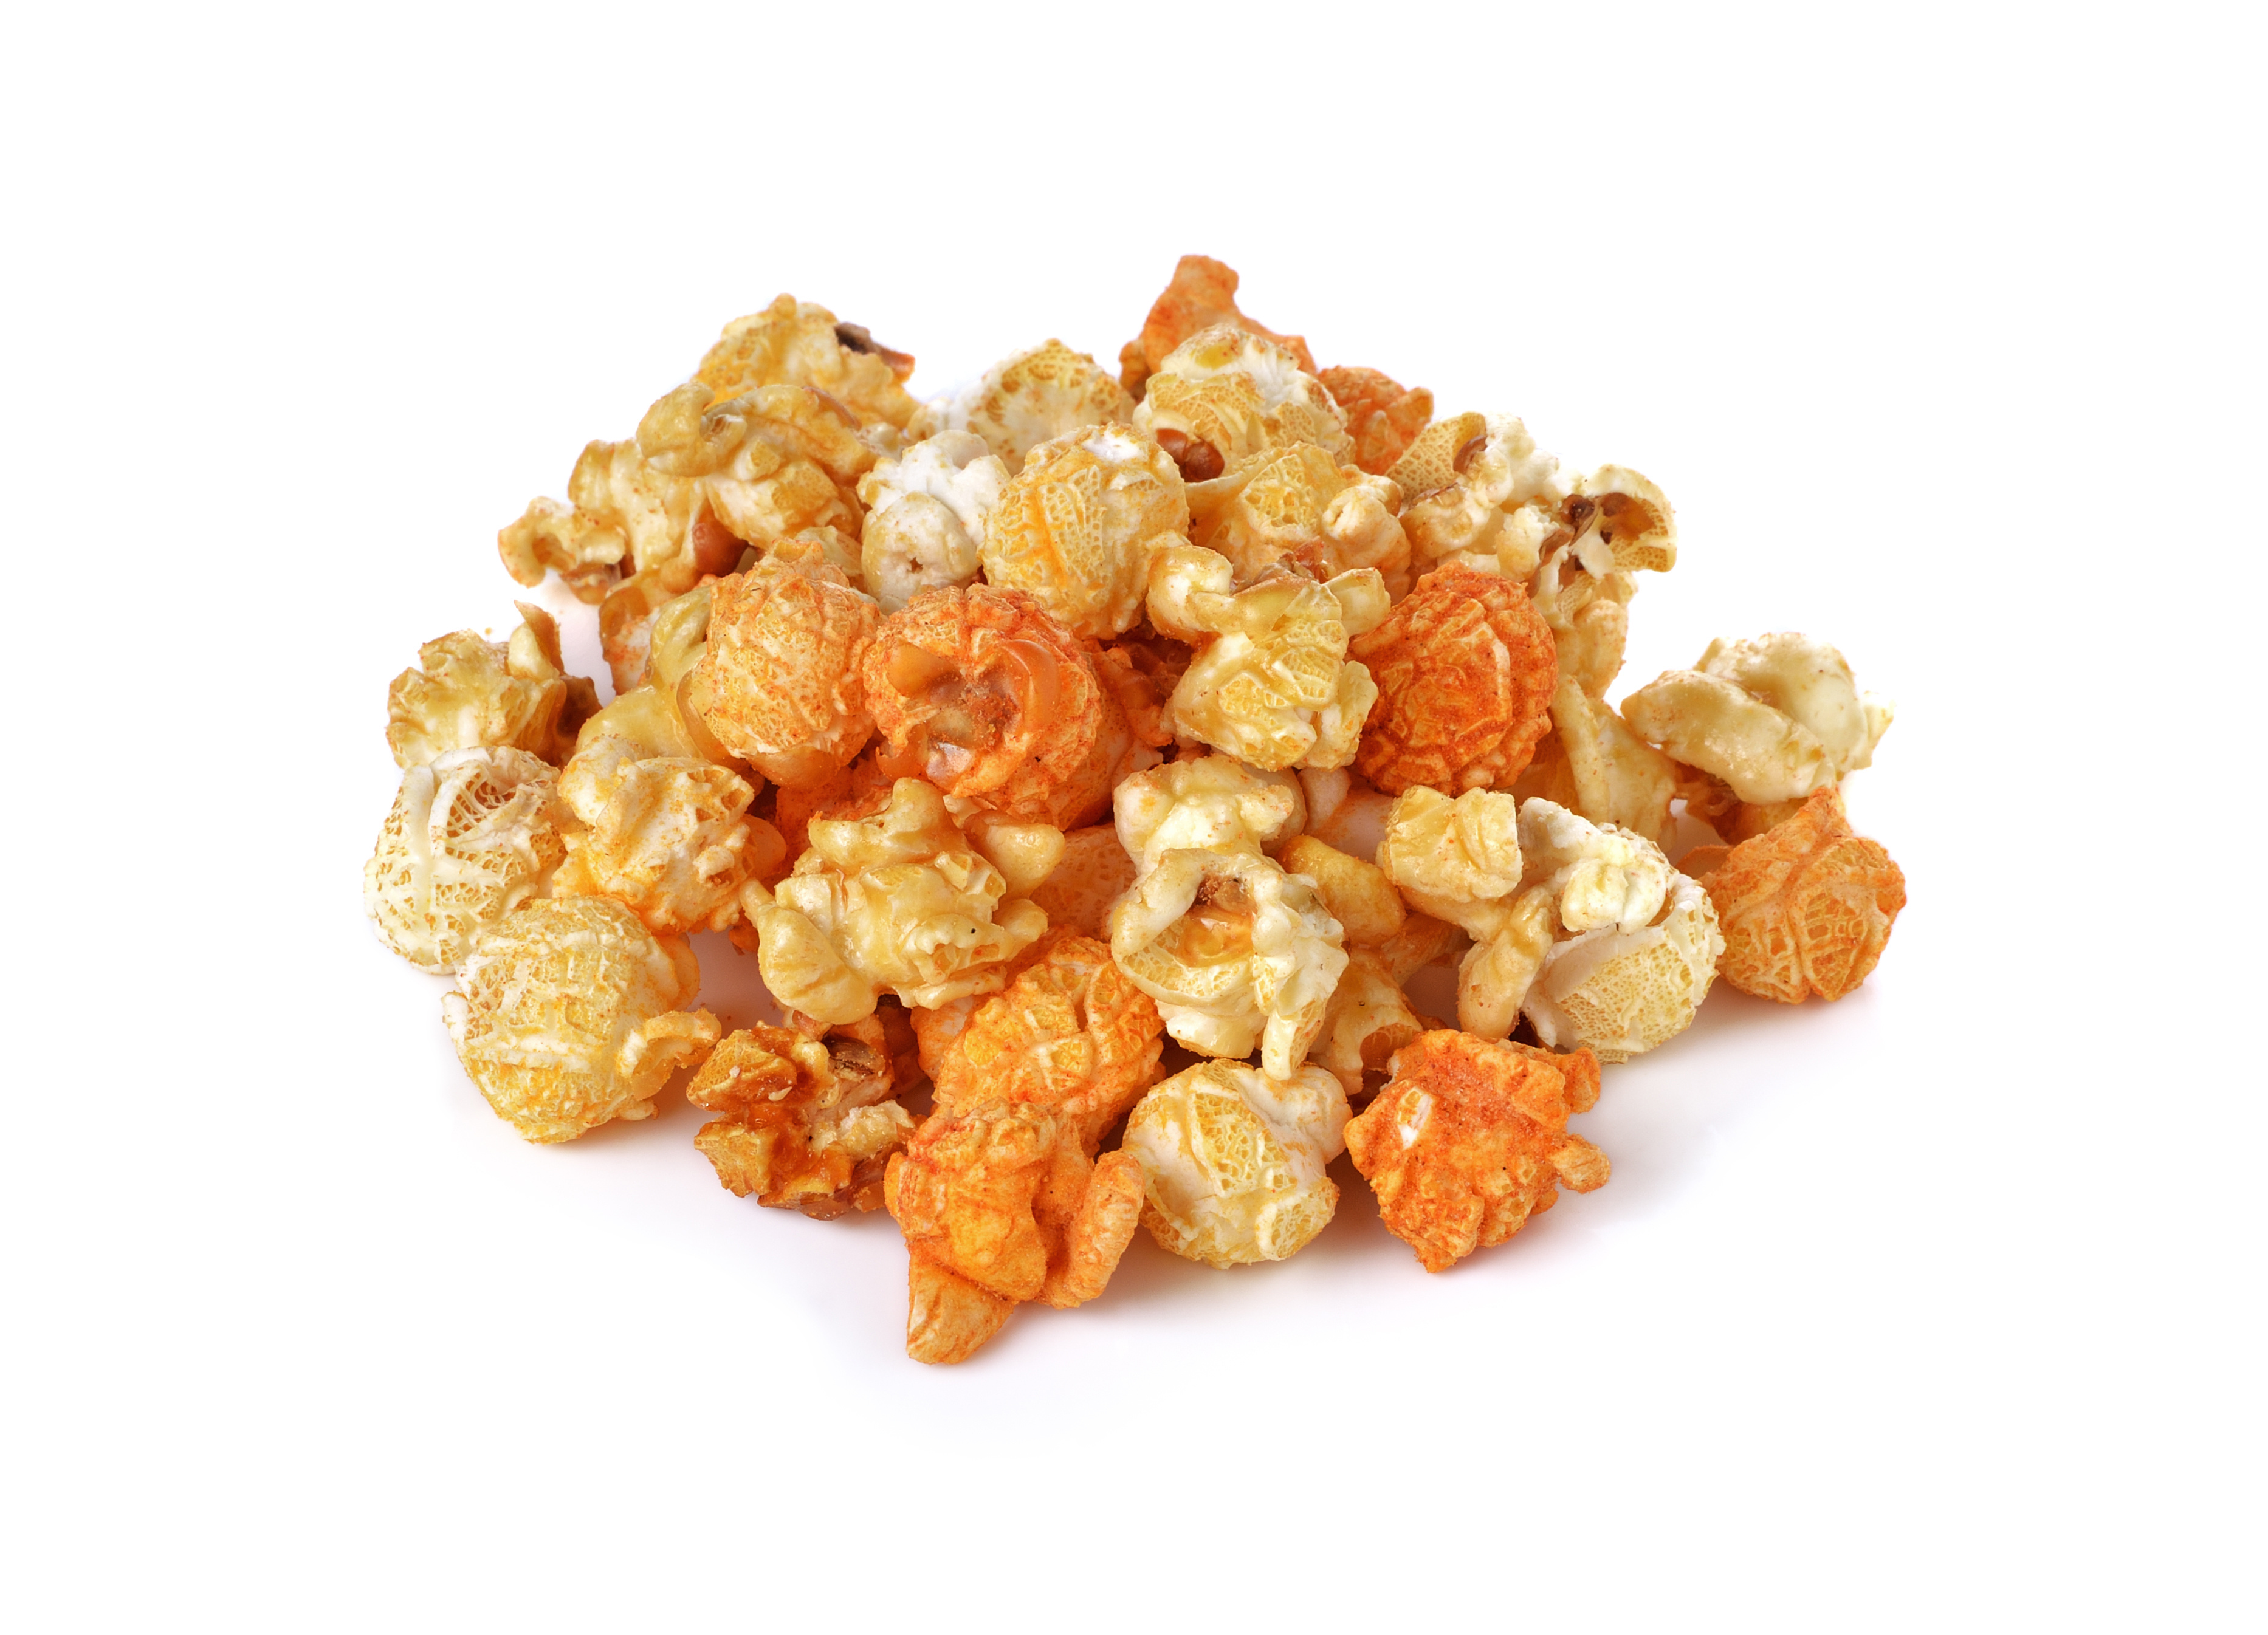 Kenny Kendalls Gourmet Popcorn